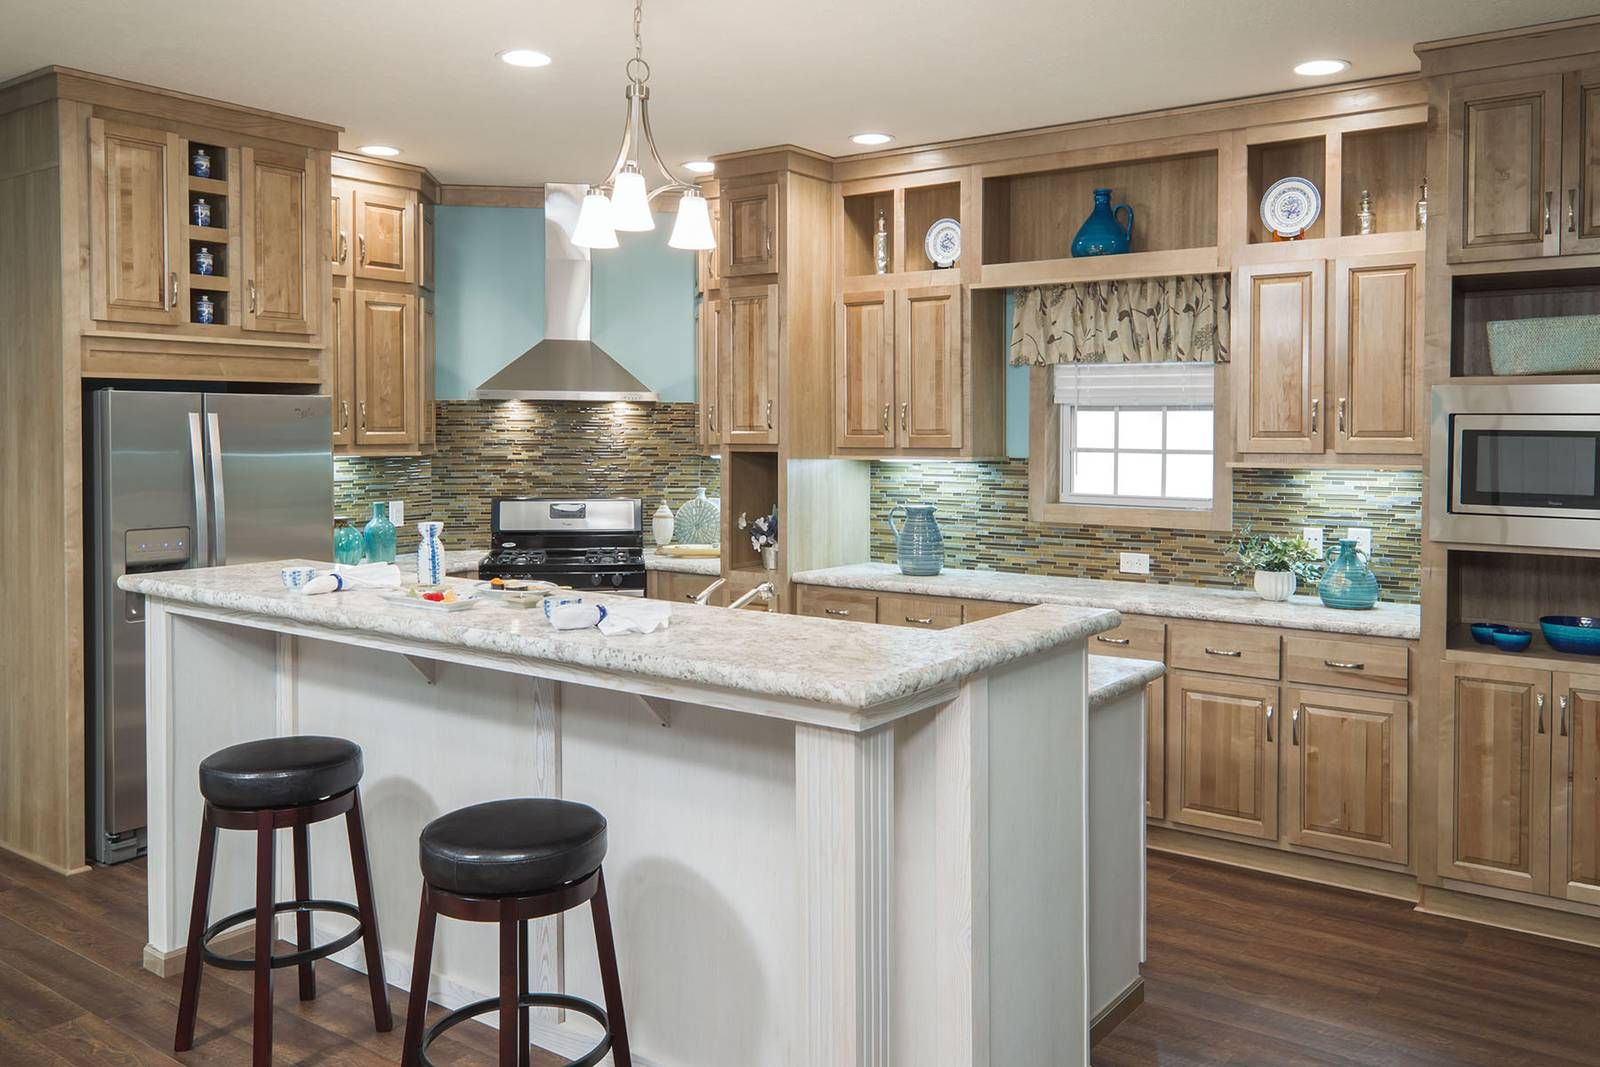 Barclay 6809 Dutch Housing Champion Homes Buy Kitchen Cabinets Kitchen Cabinetry Design Buy Kitchen